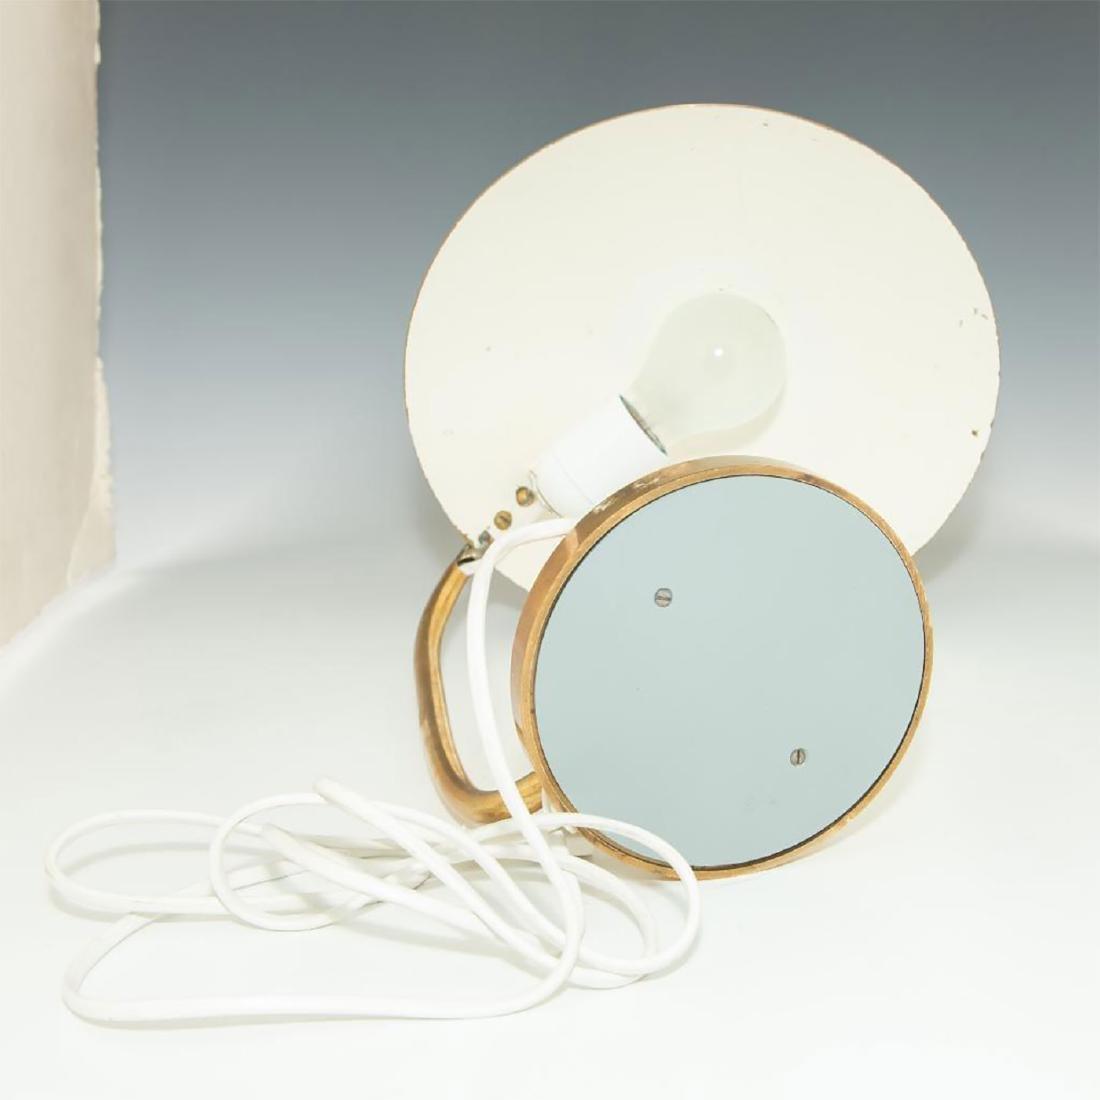 ITSU MADE FINNISH MID-CENTURY MODERN DESK LAMP - 5